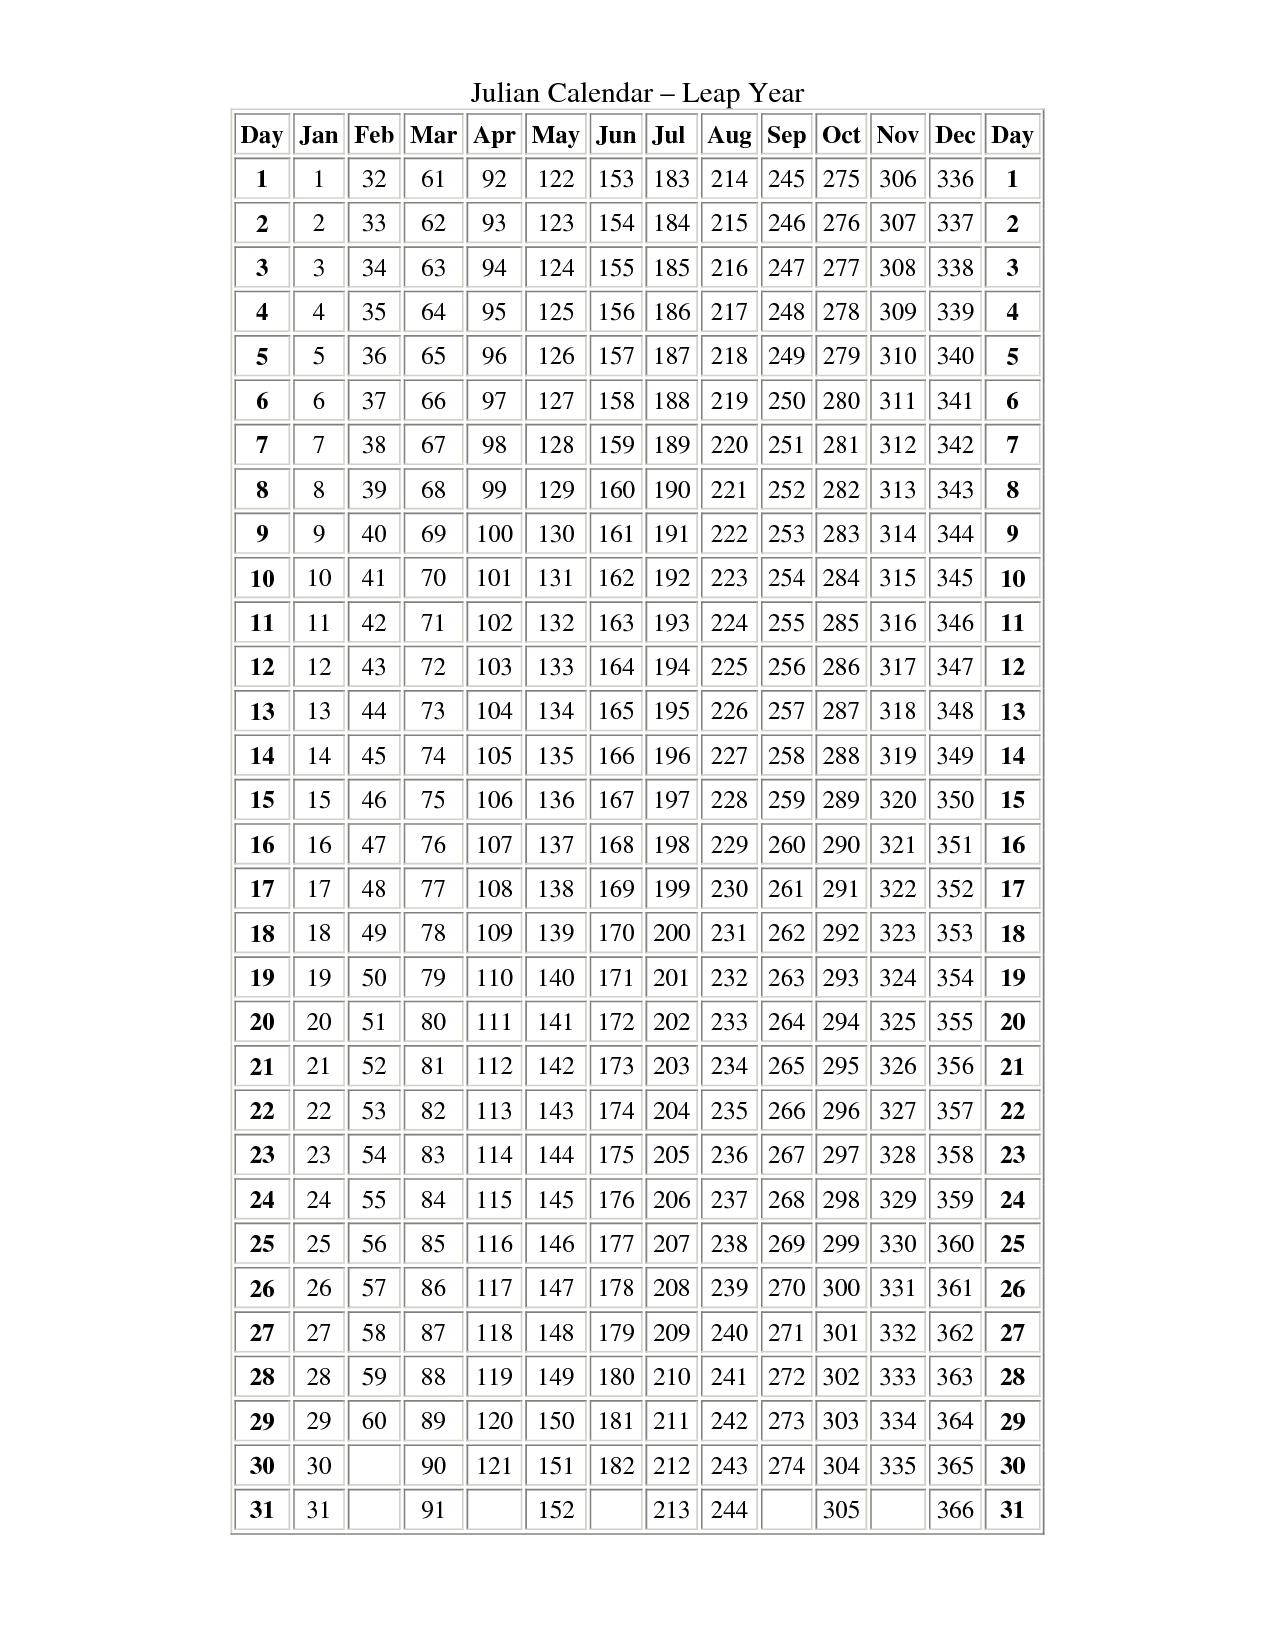 Julian Date Calendar For Non Leap Year | Template Calendar Printable with regard to Julian Calendar Non Leap Year